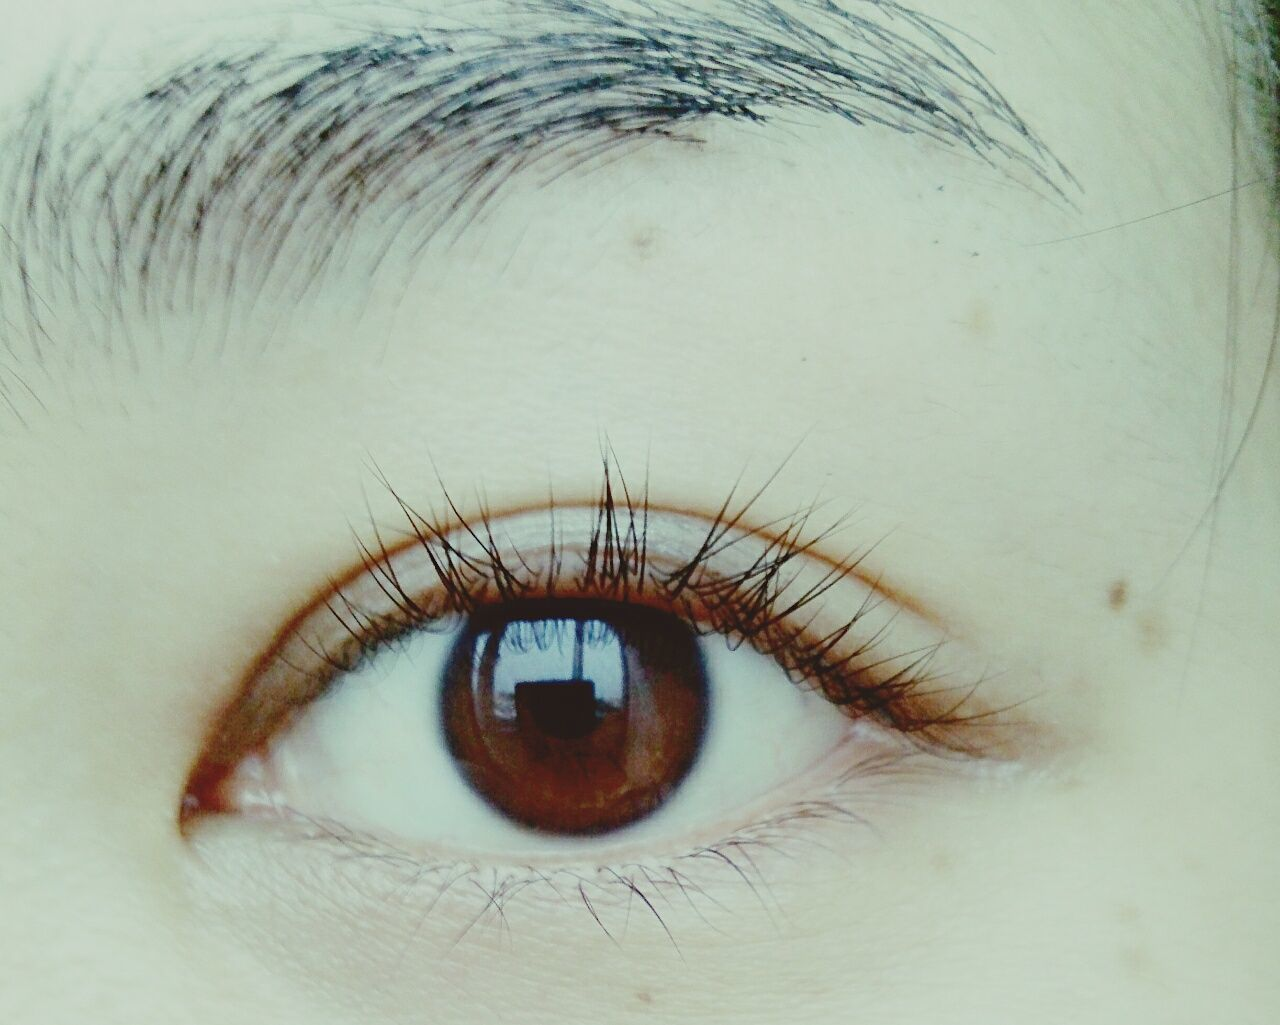 human eye, looking at camera, close-up, one person, human body part, eyelash, real people, portrait, eyesight, iris - eye, eyeball, indoors, sensory perception, day, people